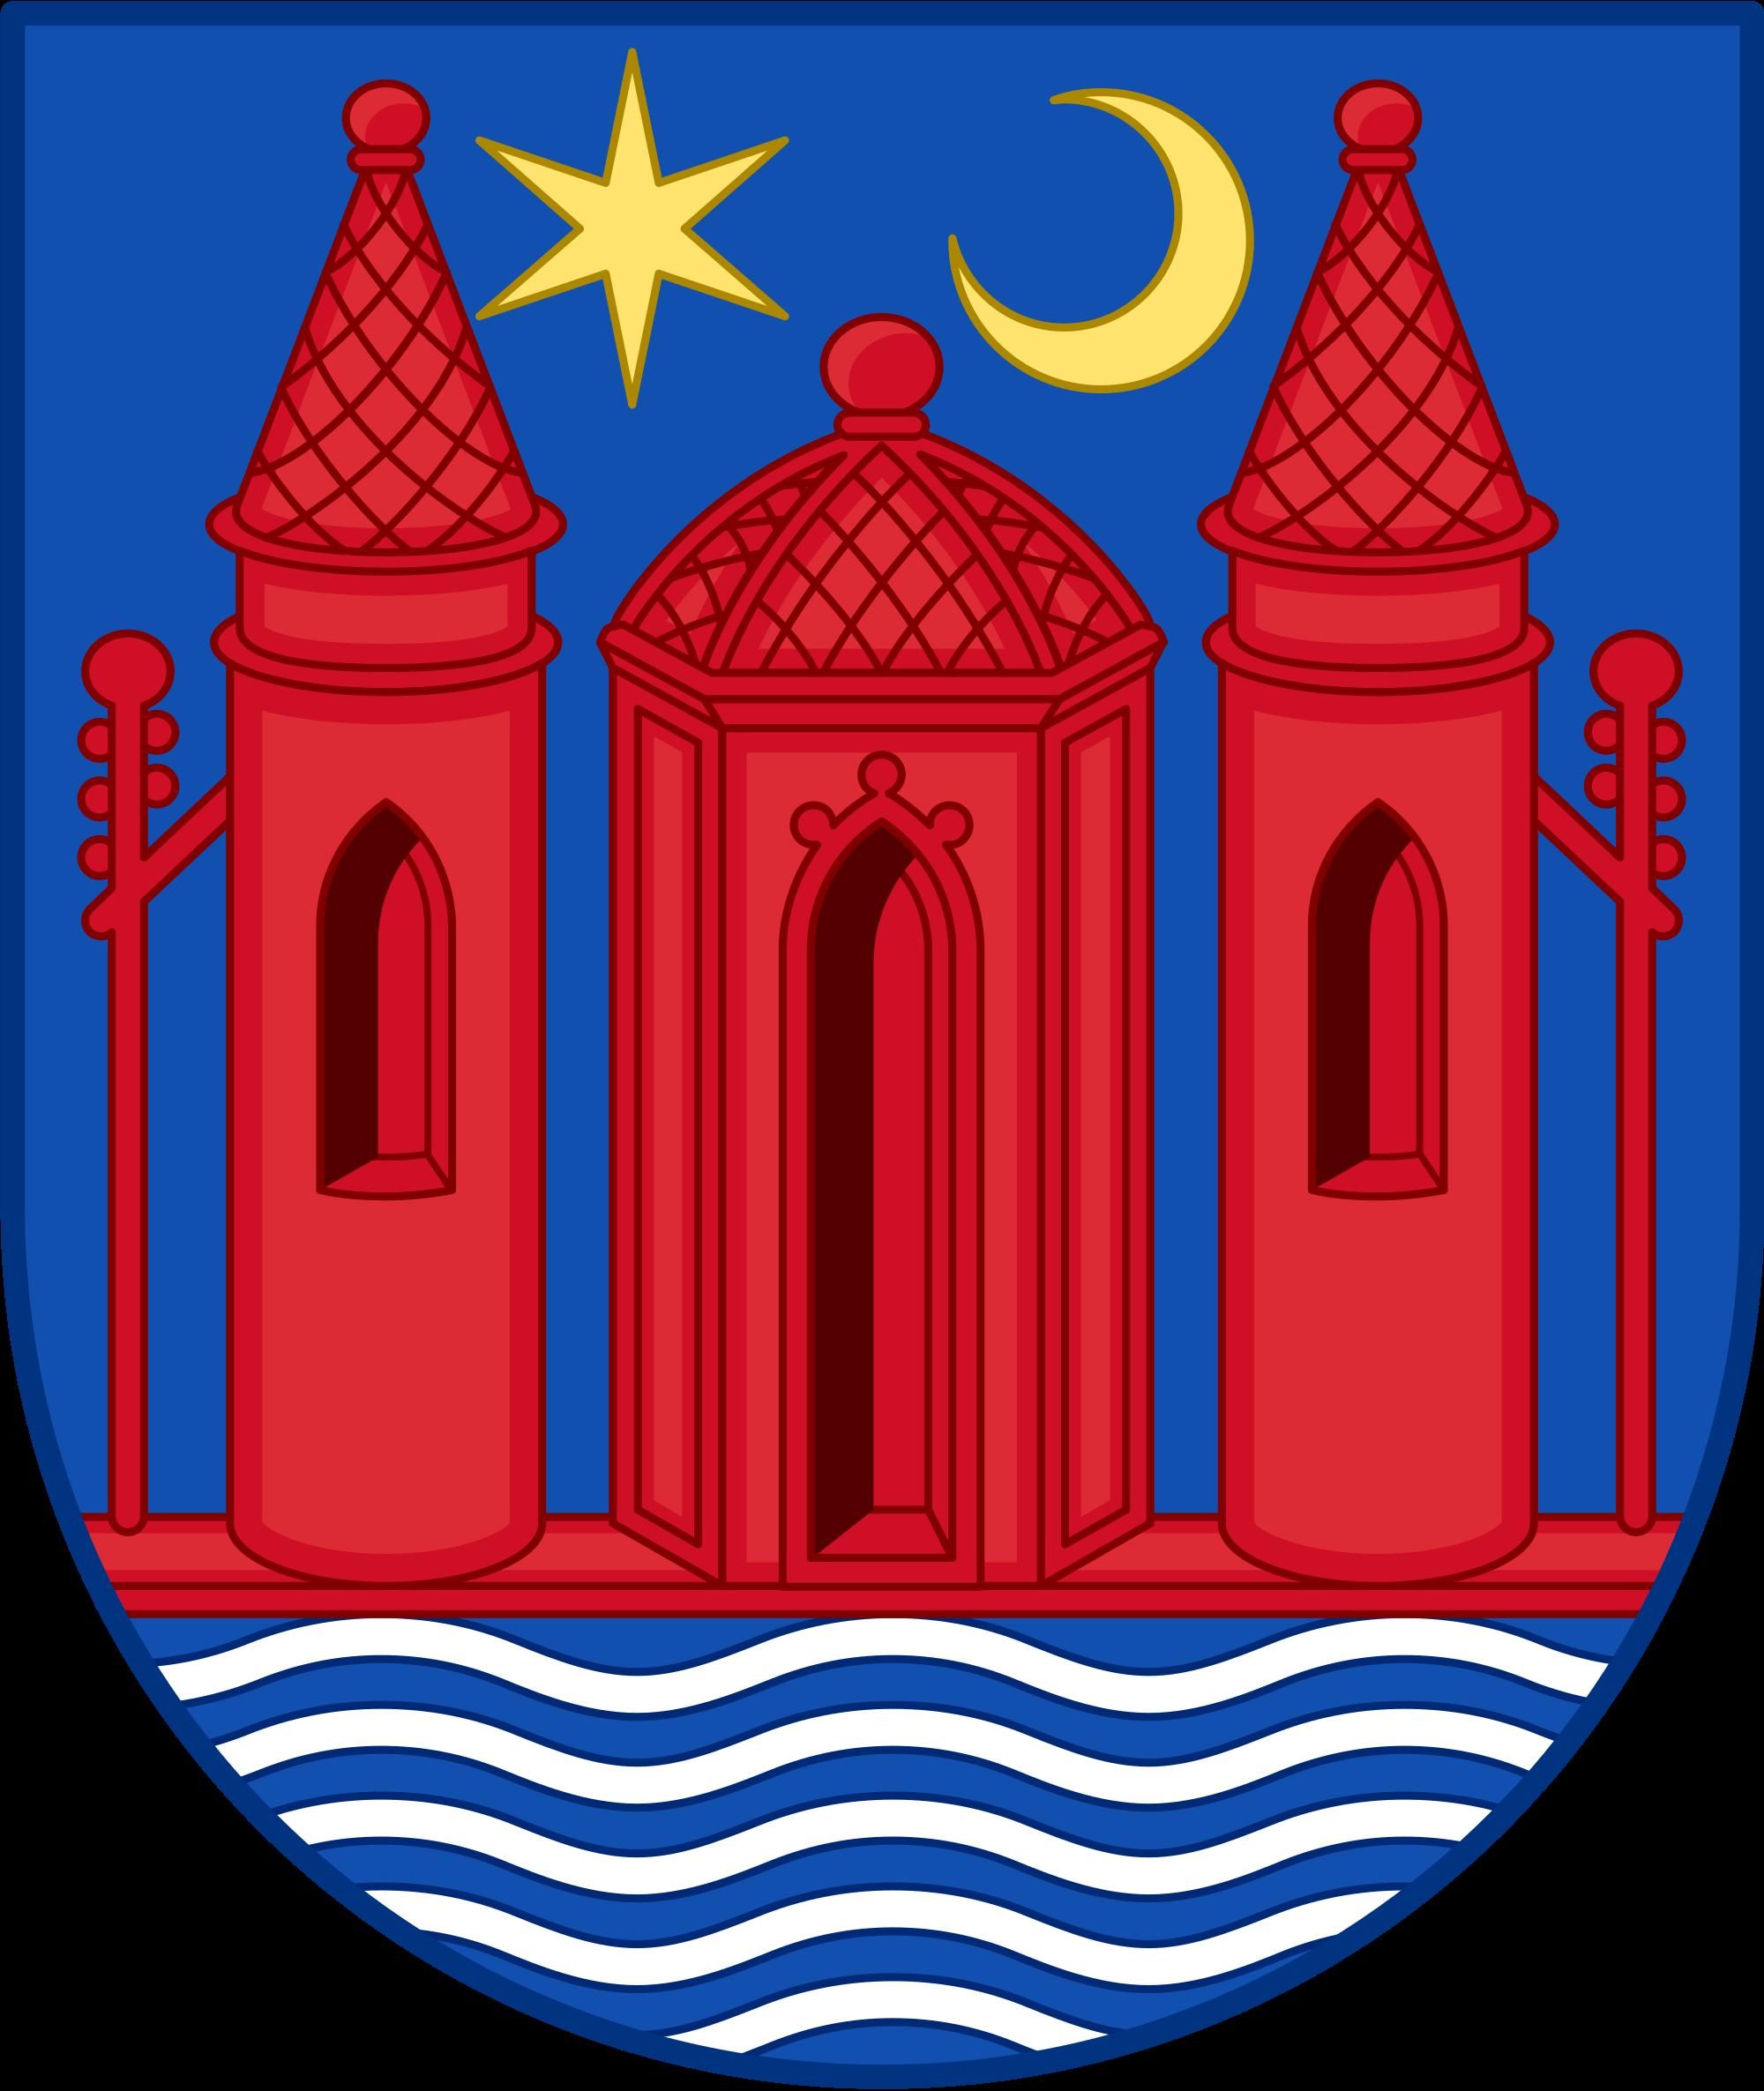 File:Coat of arms of Svendborg.svg.